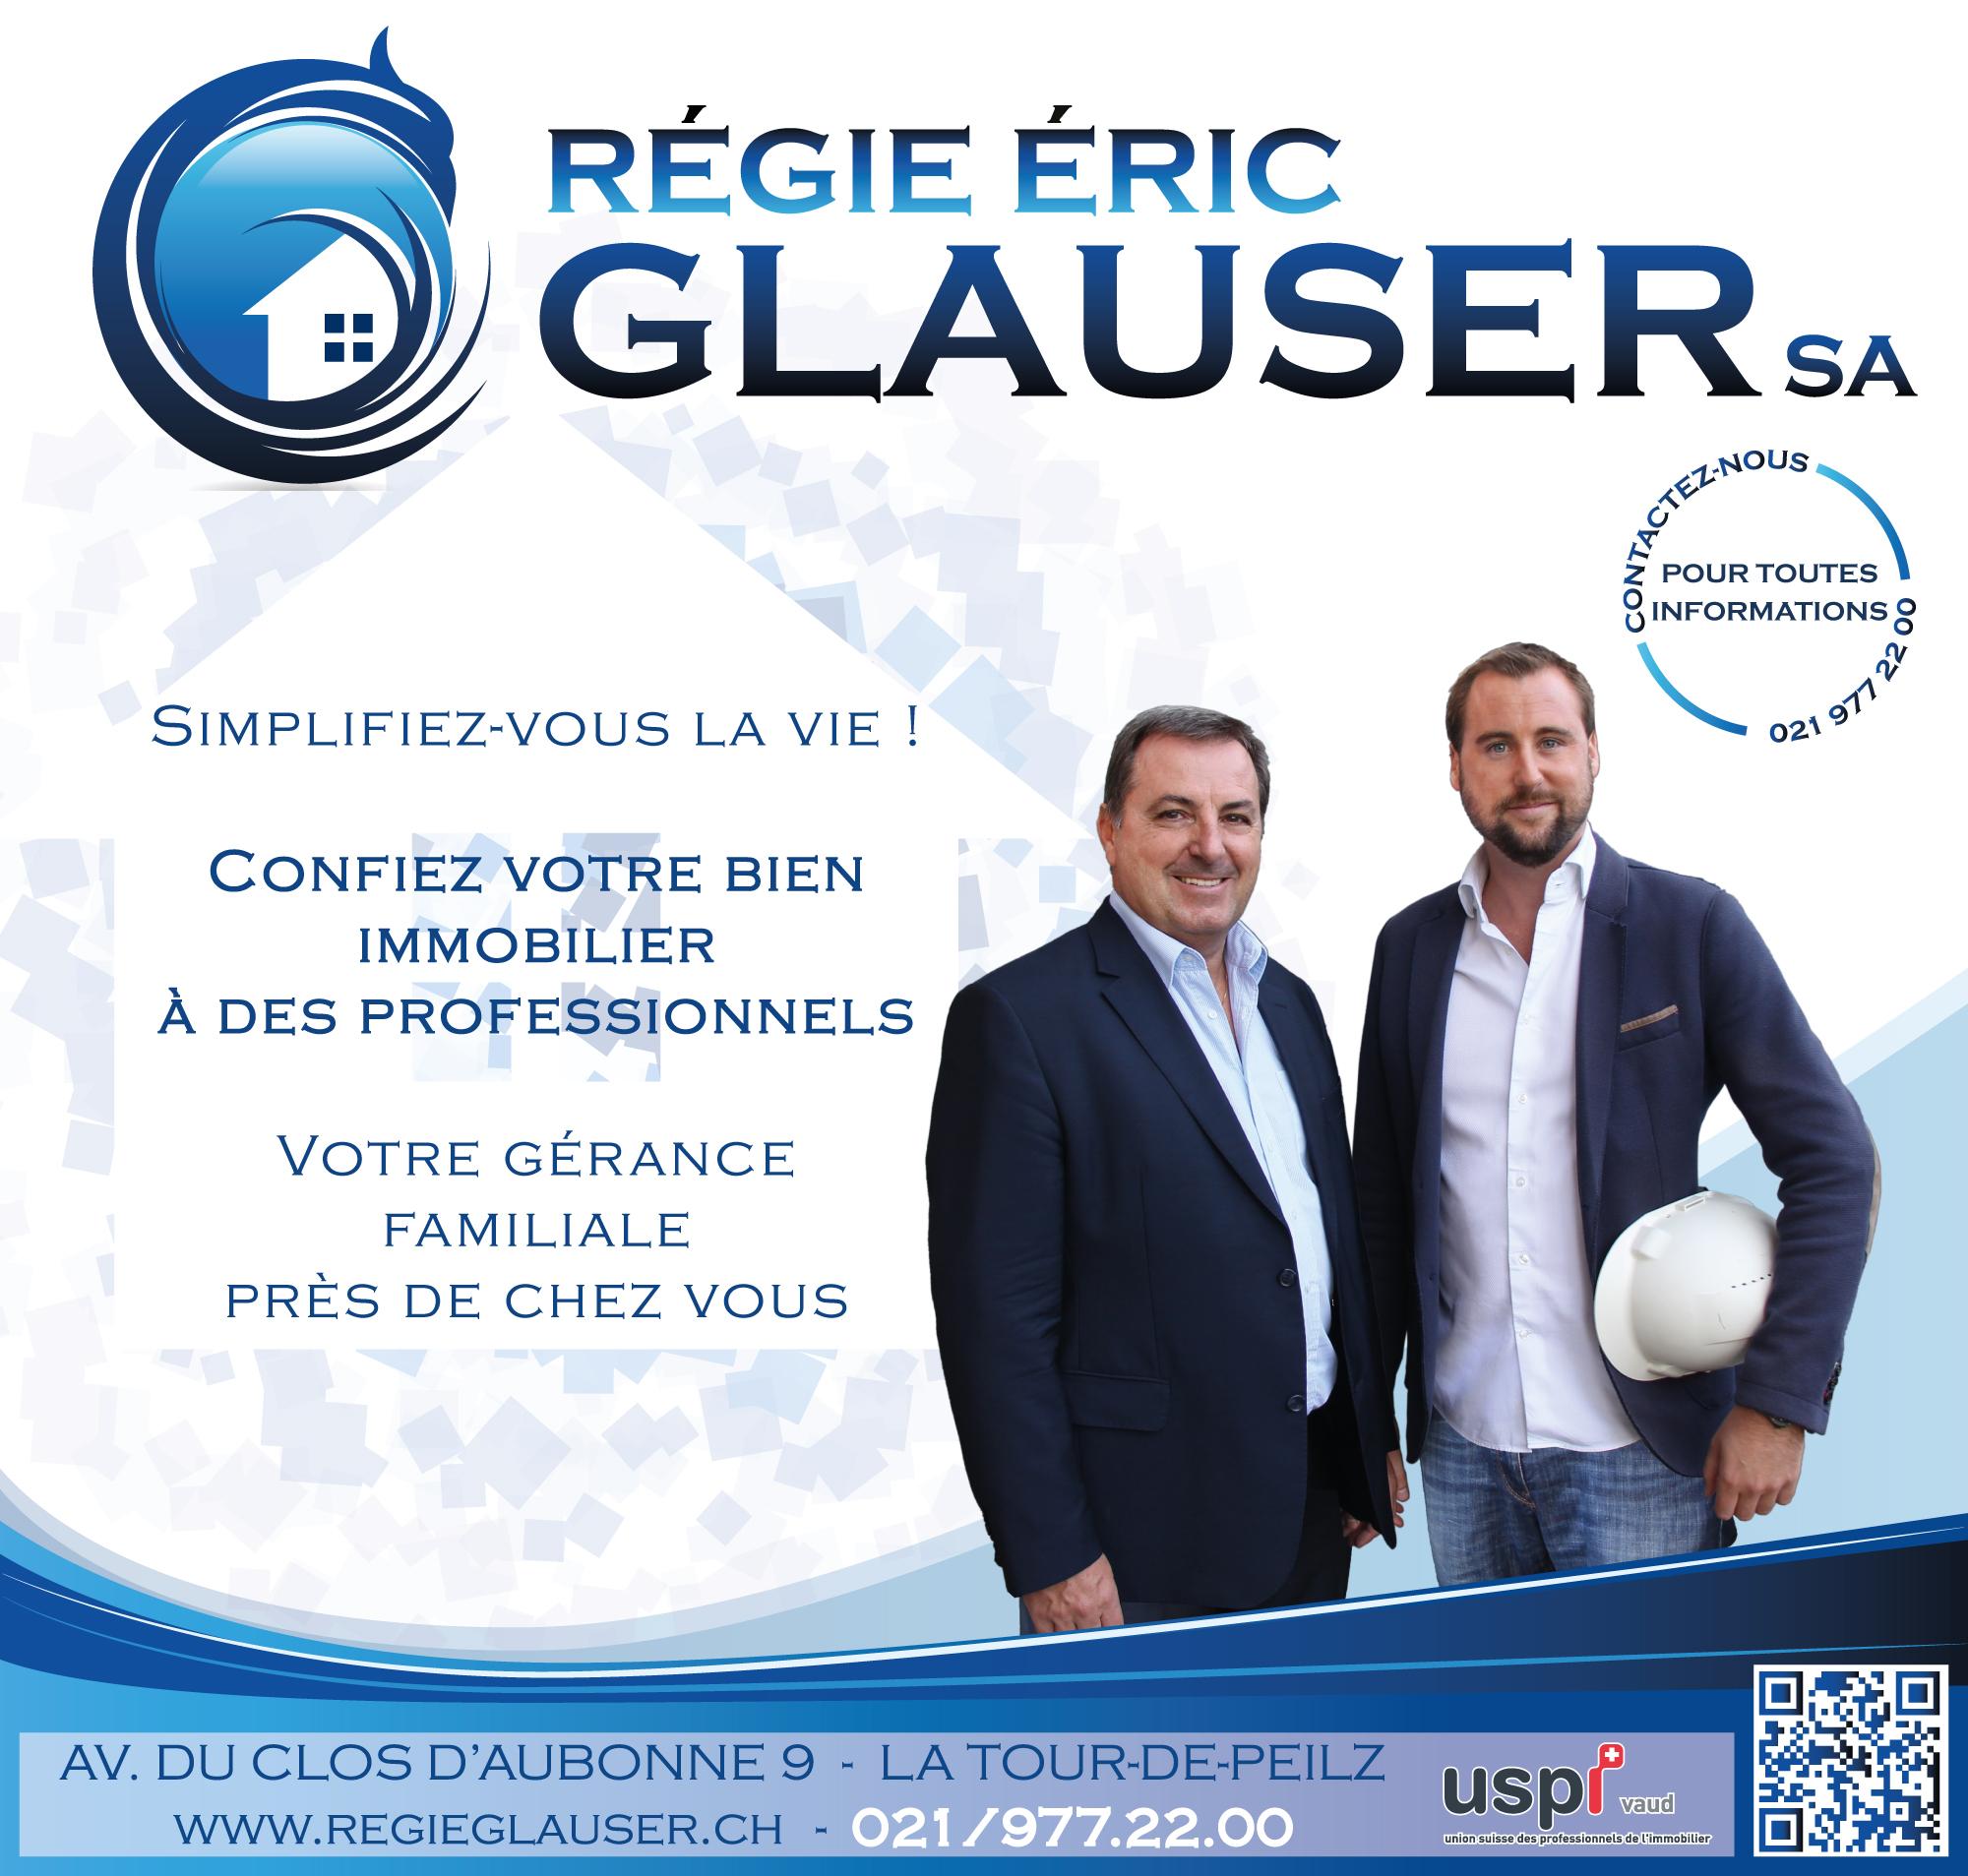 Régie Eric Glauser